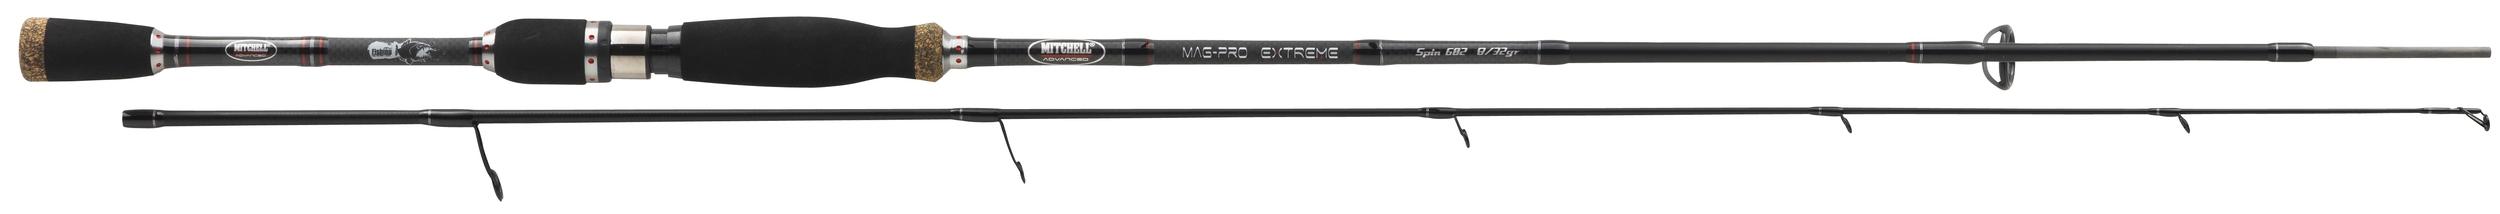 Спиннинг Mitchell Mag Pro extreme 662M